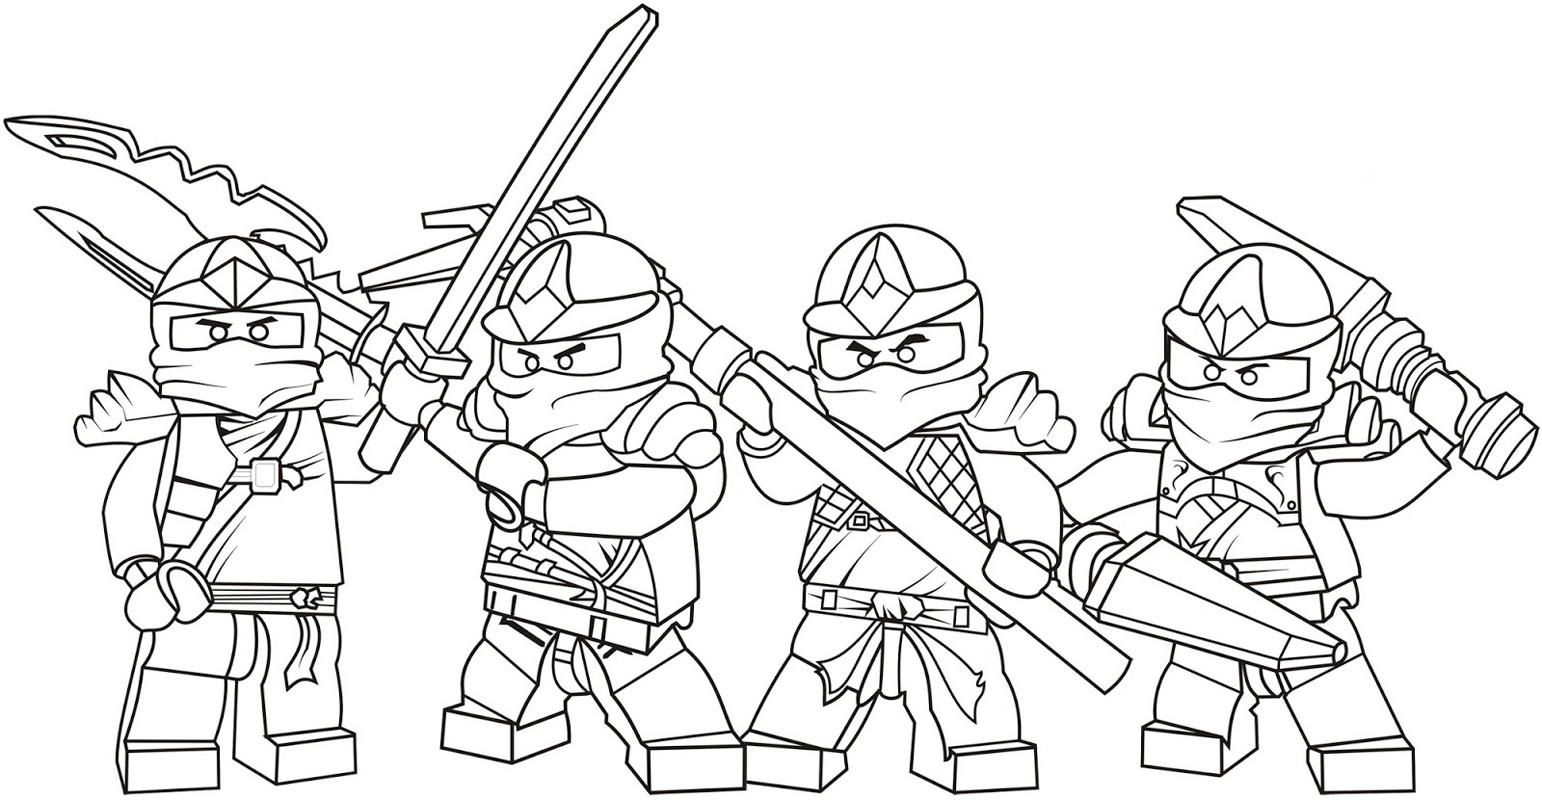 Lego Ausmalbilder Ninjago  Ausmalbilder zum Ausdrucken Ausmalbilder Lego Chima zum